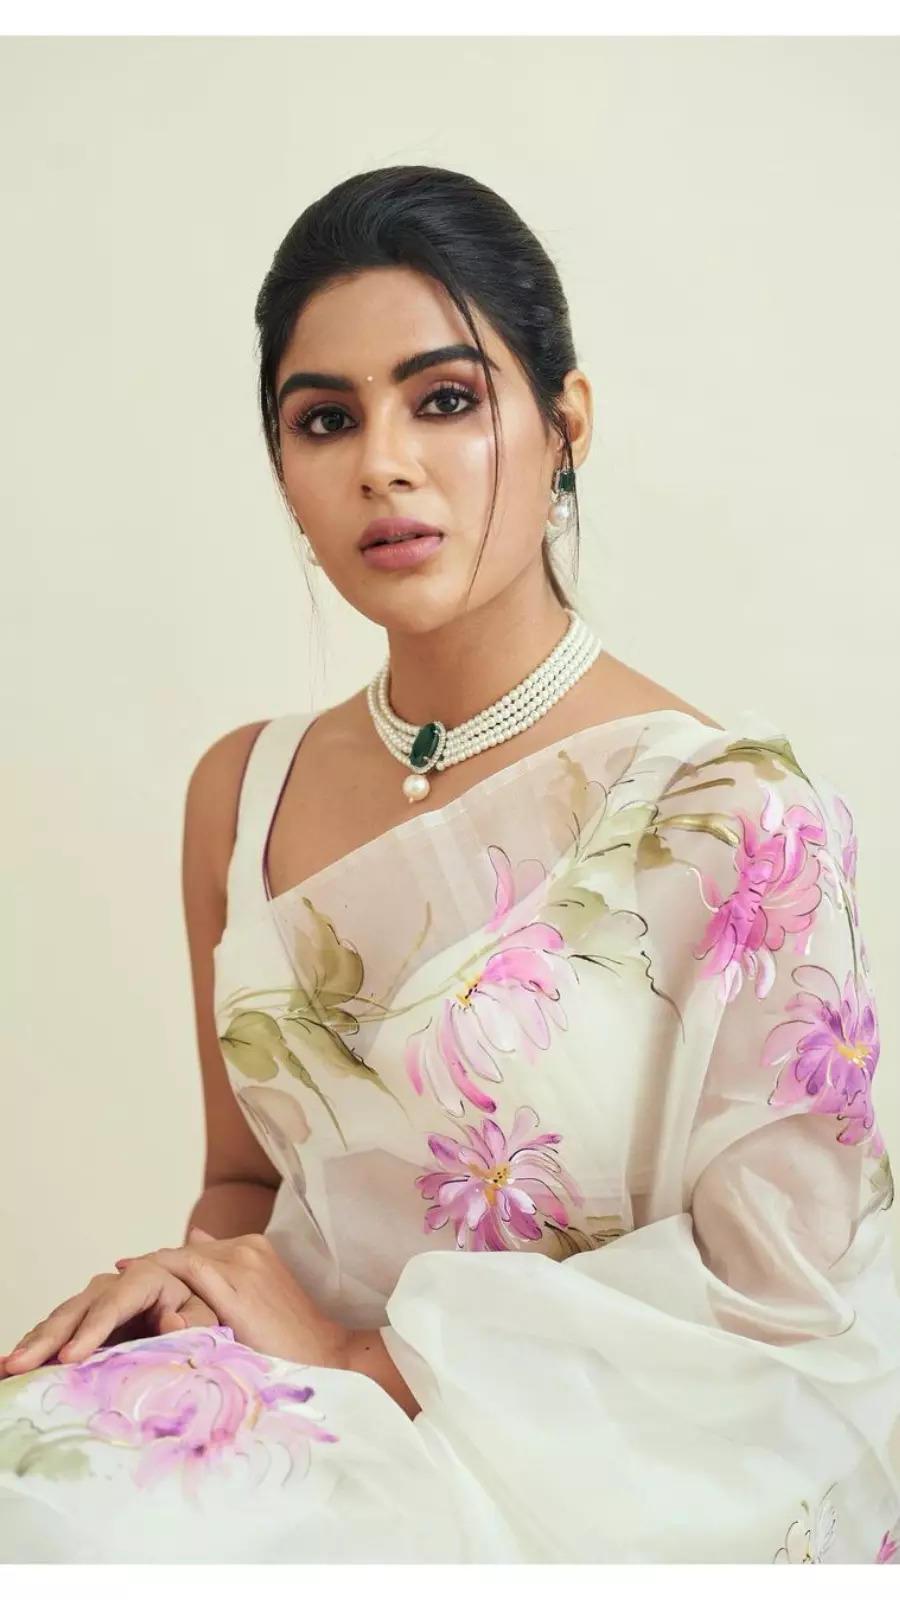 HBD Samyuktha Menon: Times when she donned ethnic ensembles with elegance